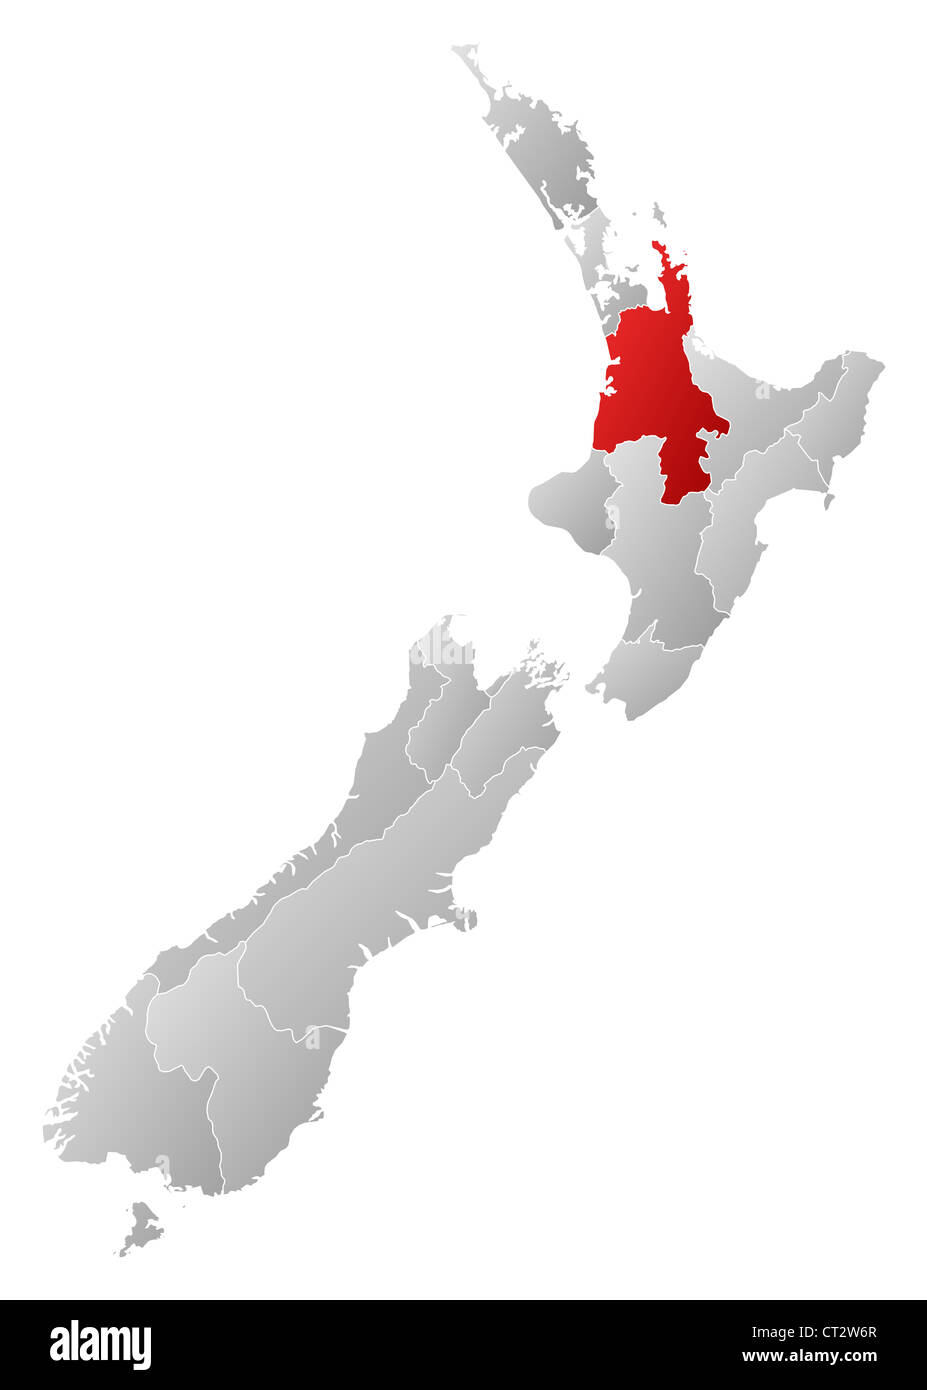 Waikato New Zealand Map.Political Map Of New Zealand With The Several Regions Where Waikato